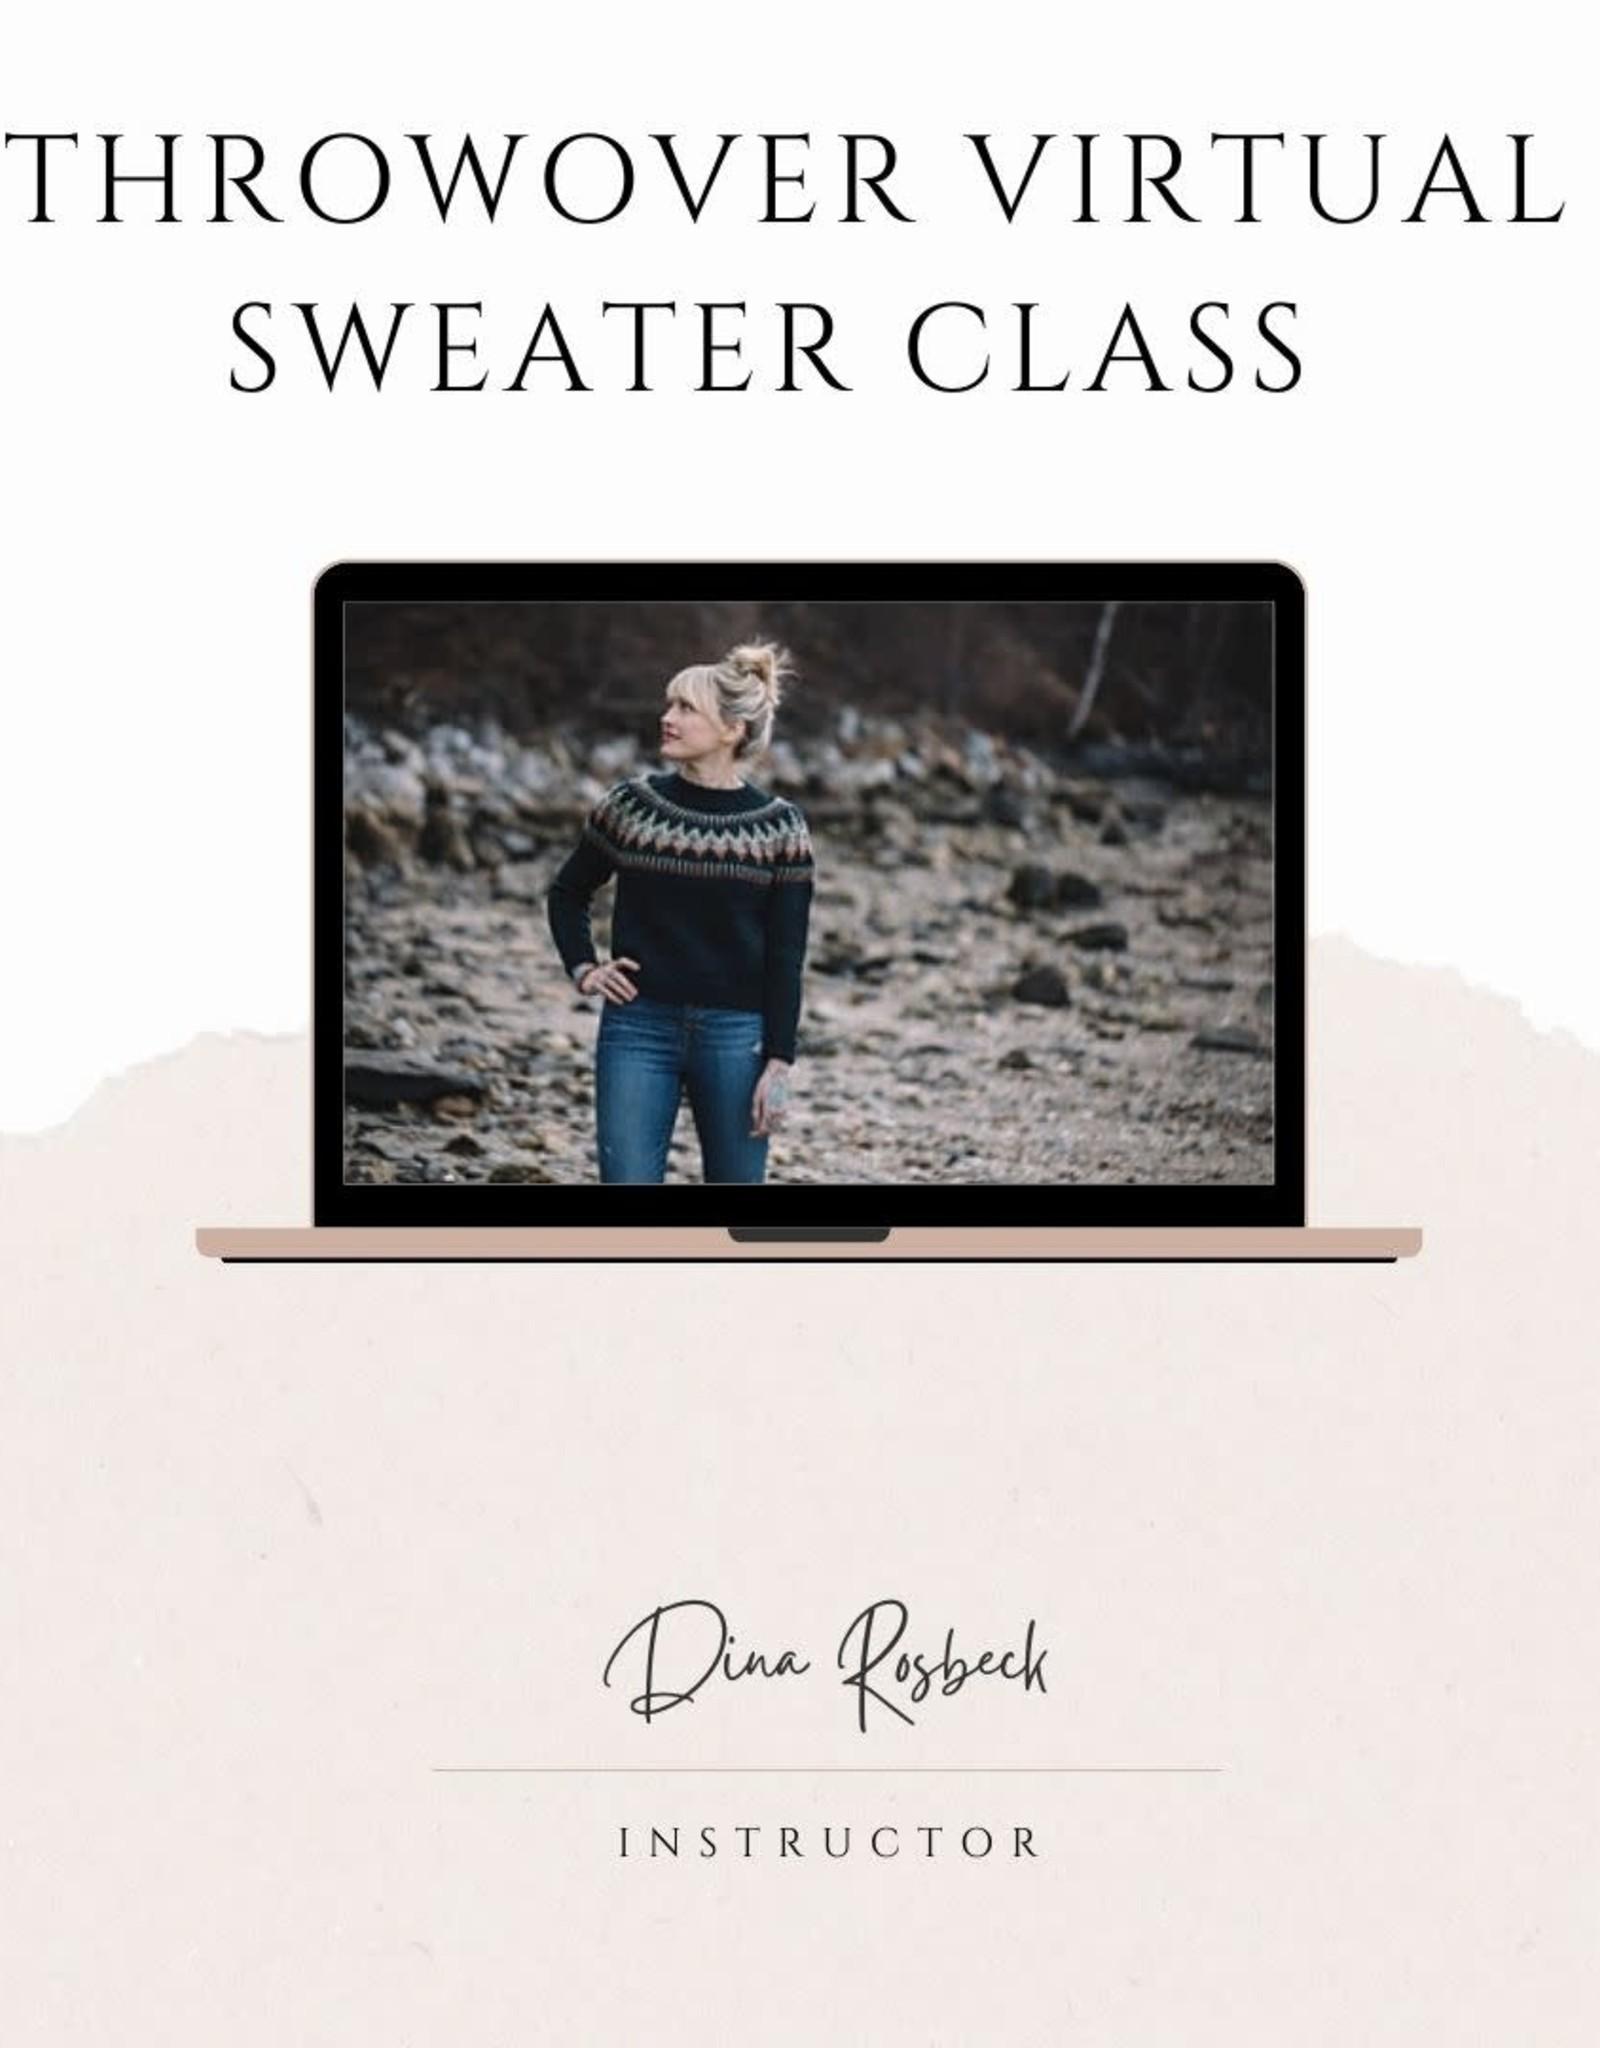 Throwover Sweater VIRTUAL class